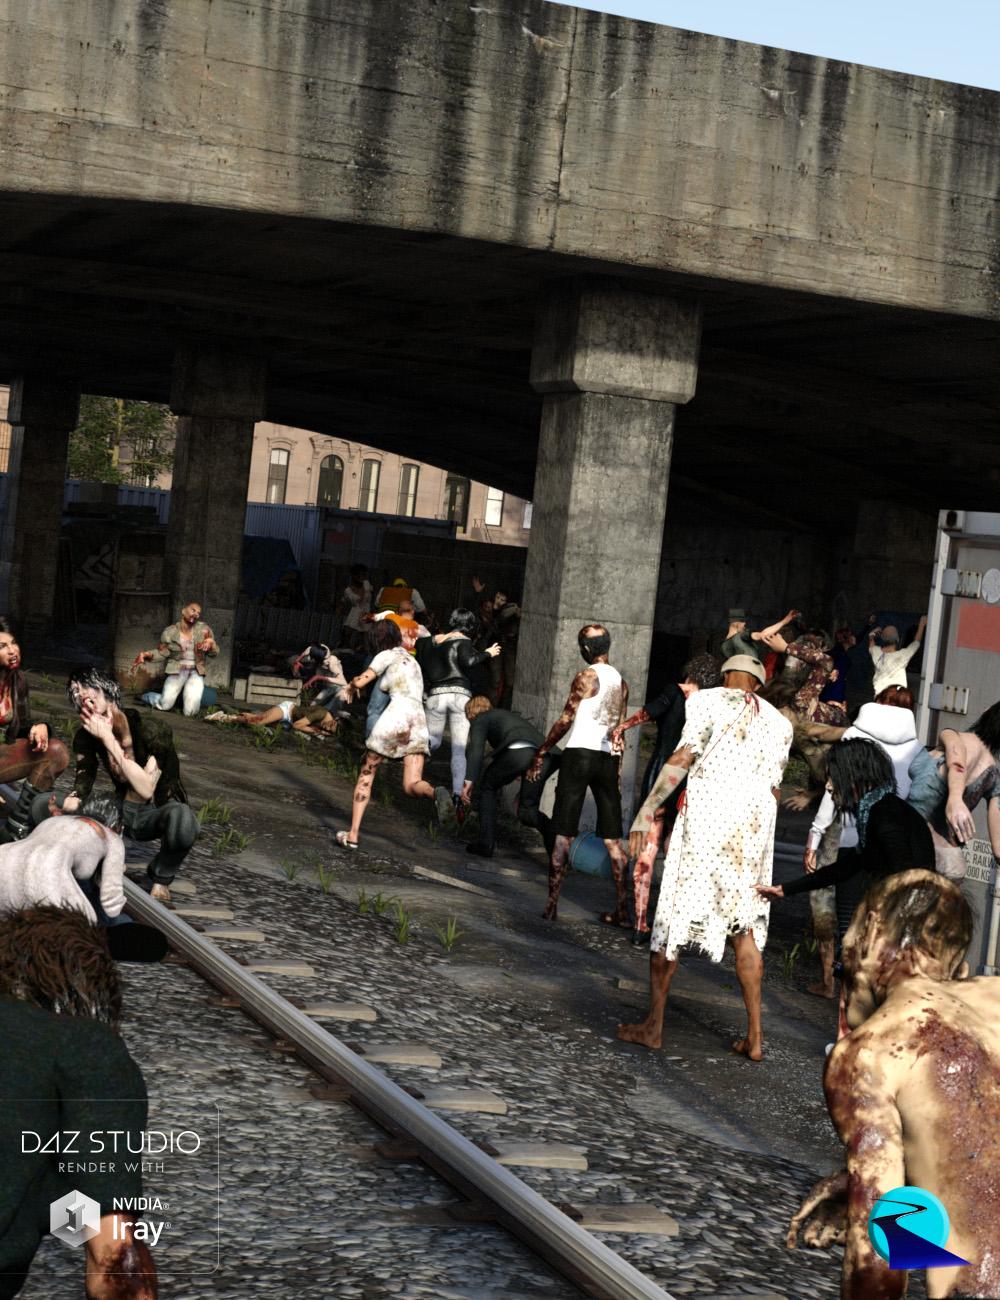 Now-Crowd Billboards - Zombie Apocalypse by: RiverSoft Art, 3D Models by Daz 3D